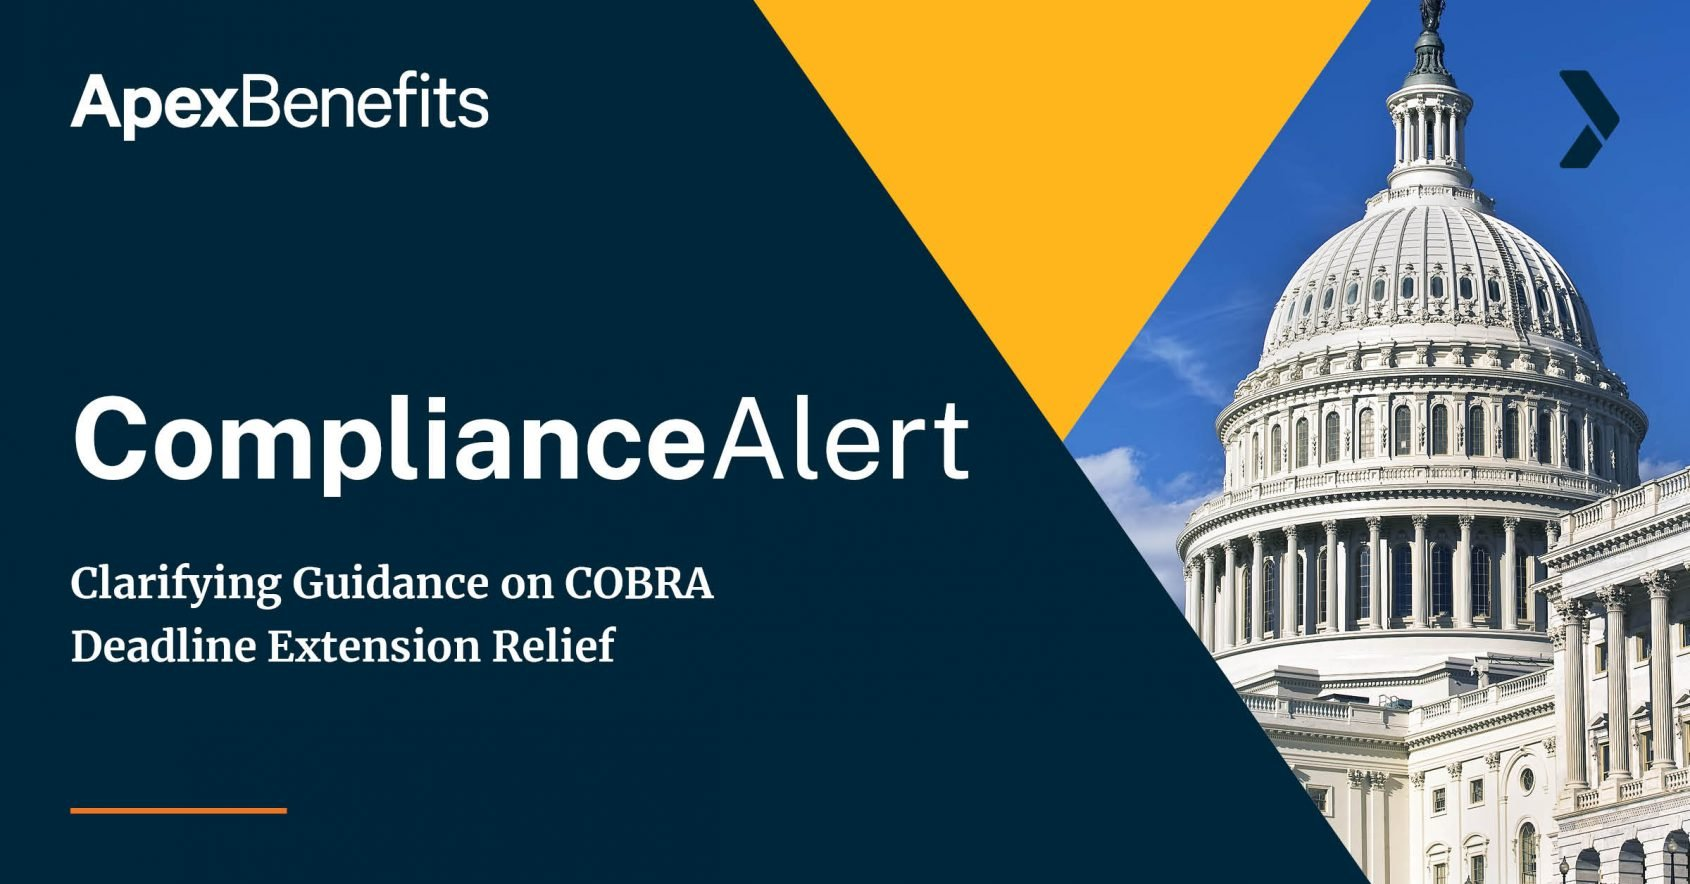 CA COBRA Deadline Extension